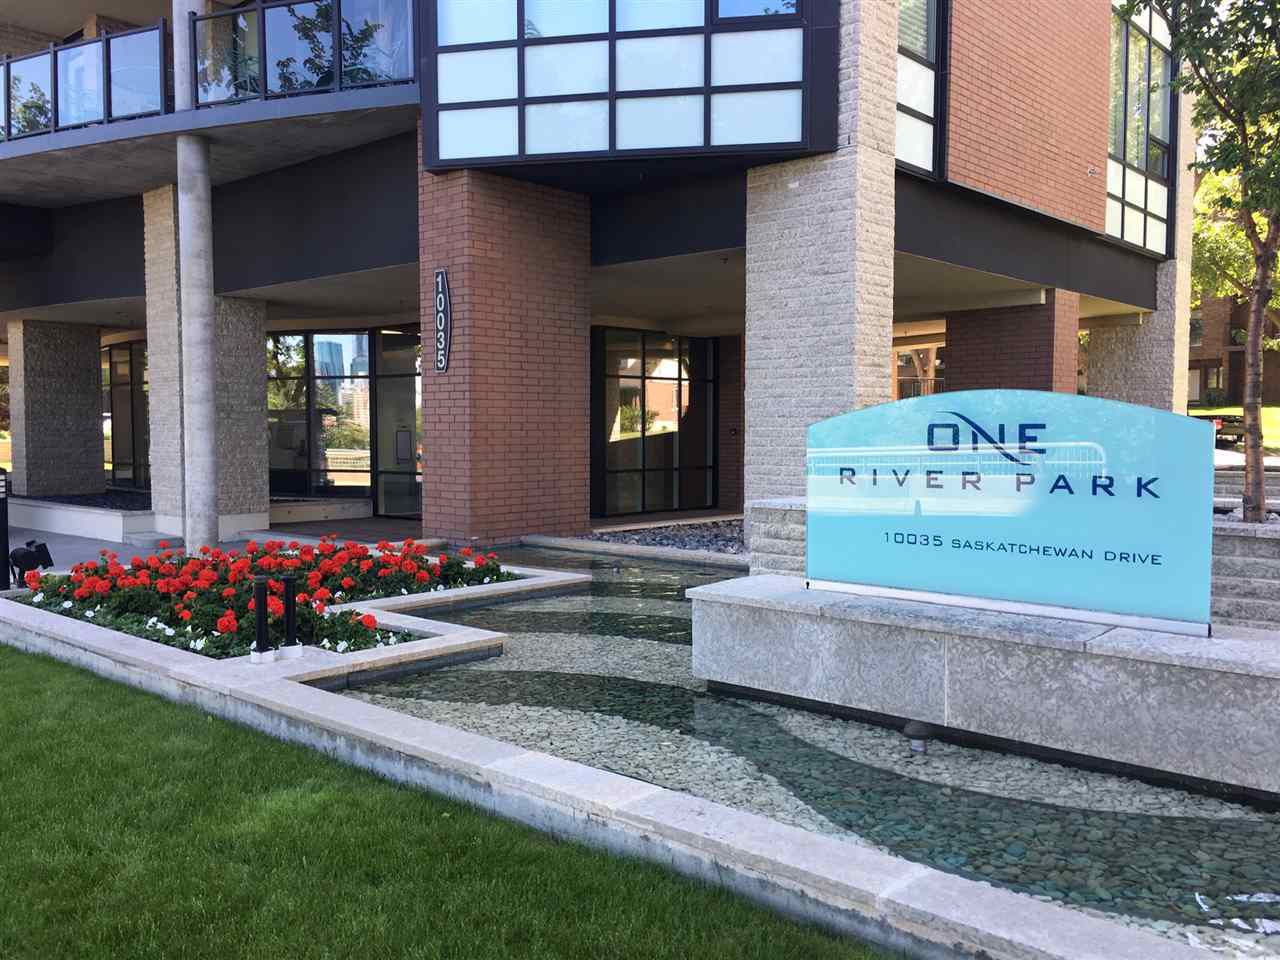 Photo 2: Photos: 401 10035 SASKATCHEWAN Drive in Edmonton: Zone 15 Condo for sale : MLS®# E4147730